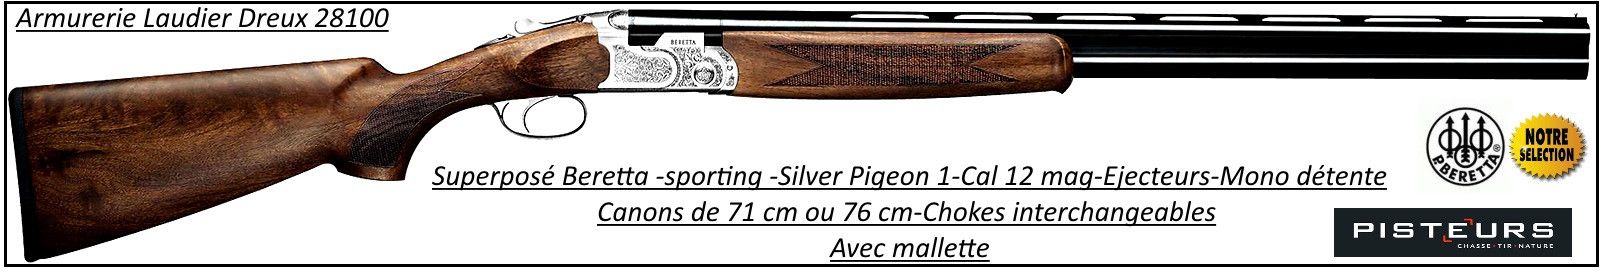 "Superposé-Beretta-Silver-Pigeon-1-Sporting-Parcours de chasse-Cal 12 mag-Canons 76 cm-""Promotion""-Ref 24438"